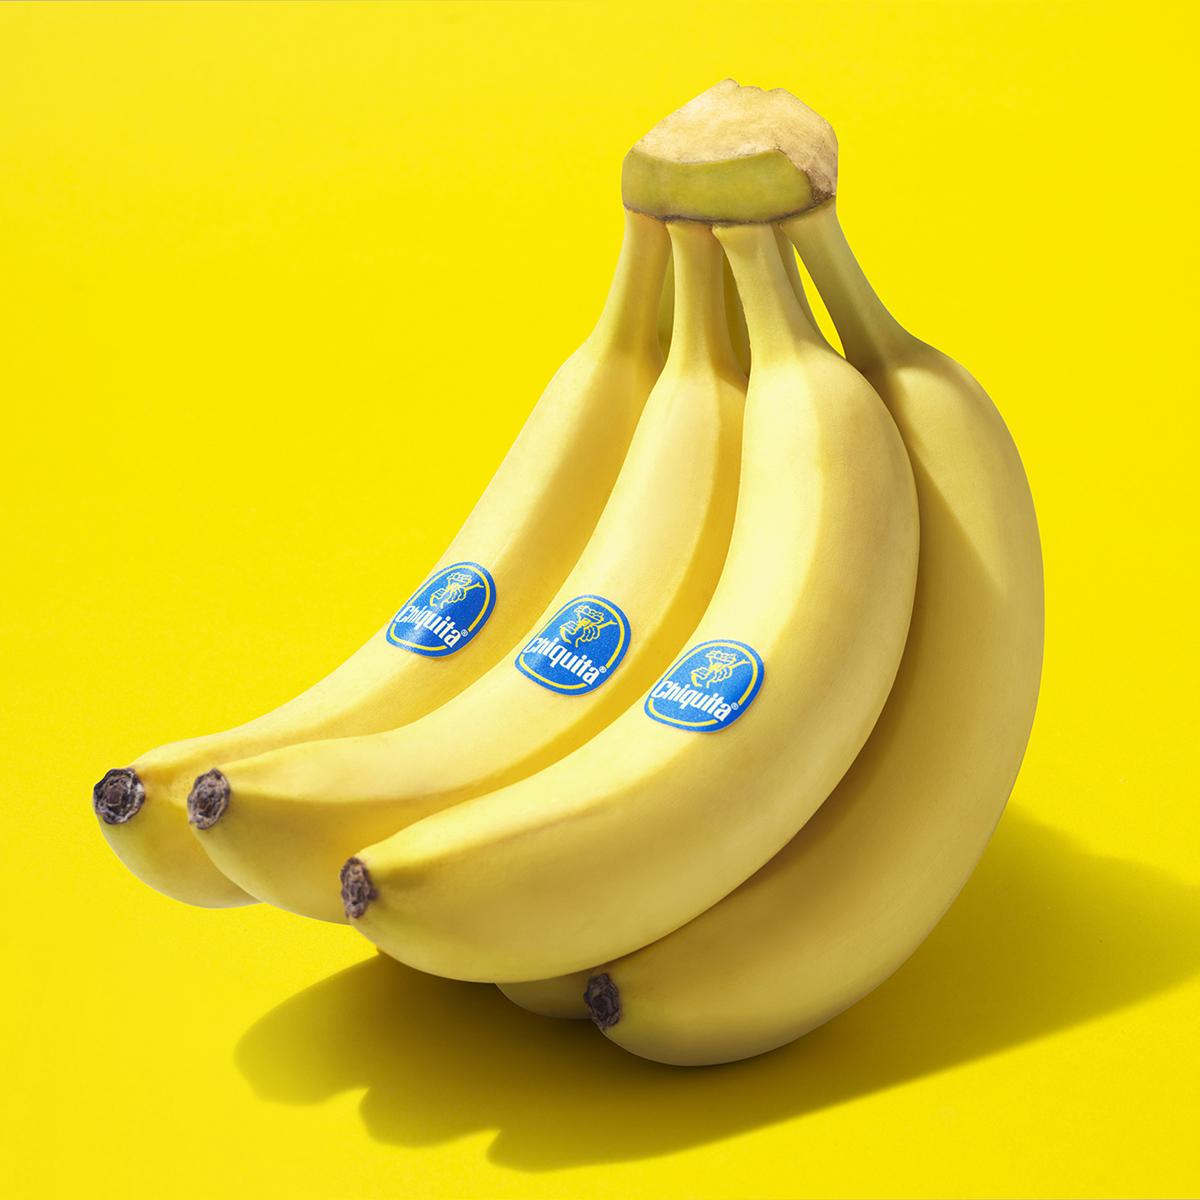 Chiquita bananas class extra | Chiquita fresh fruits